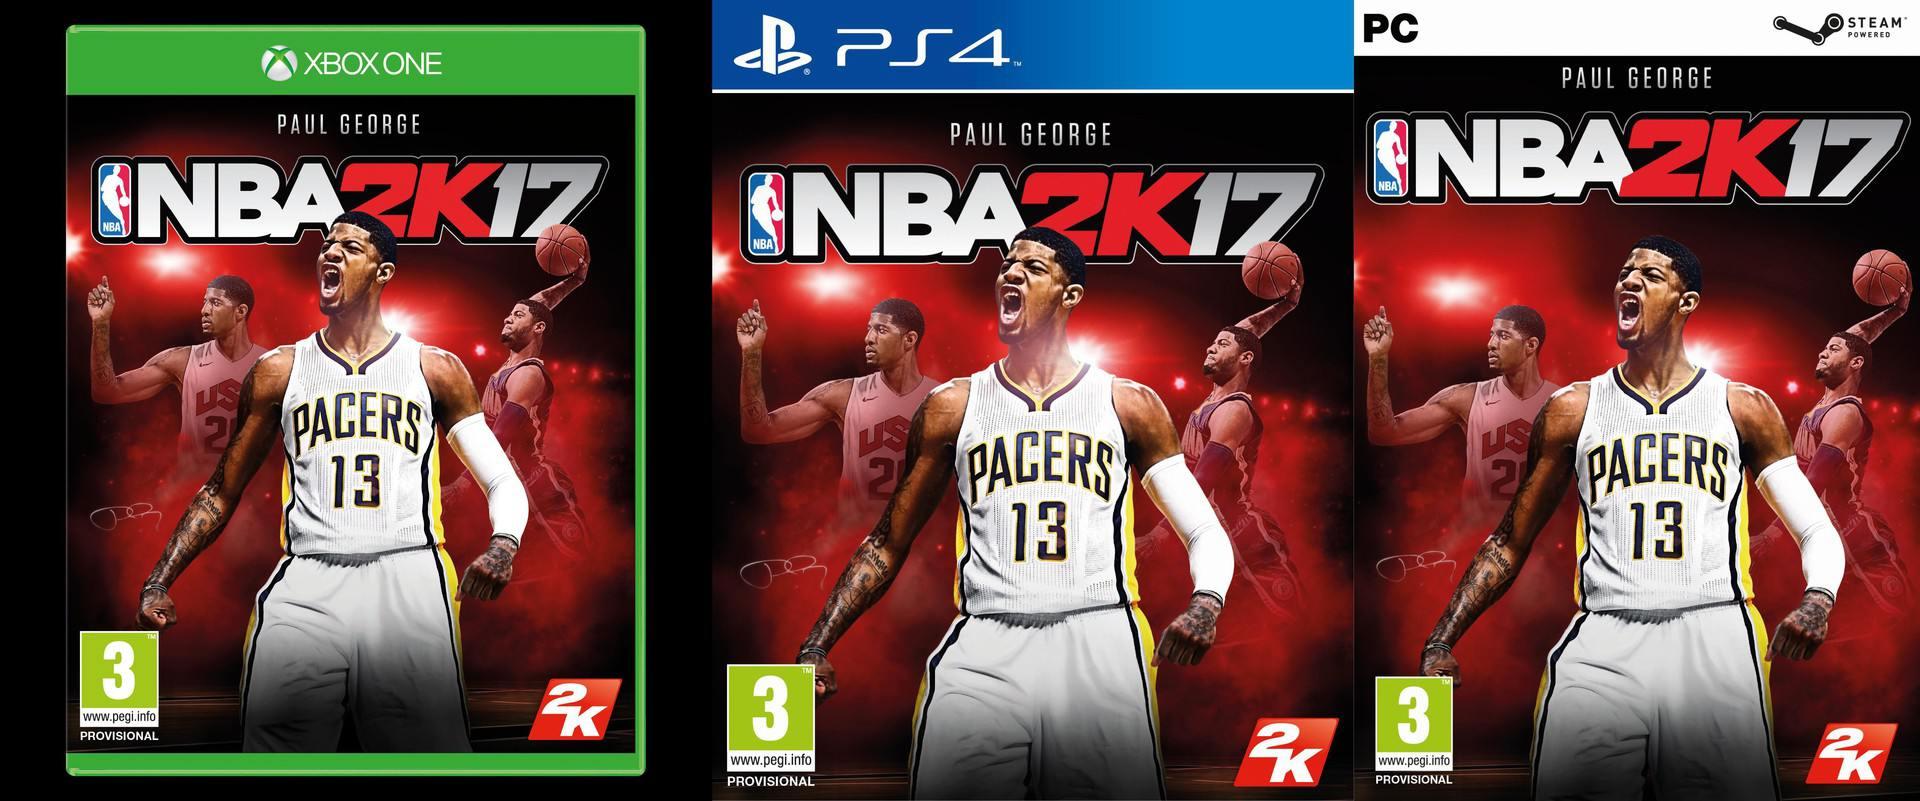 NBA 2K17 Cover Athlete Finally Revealed